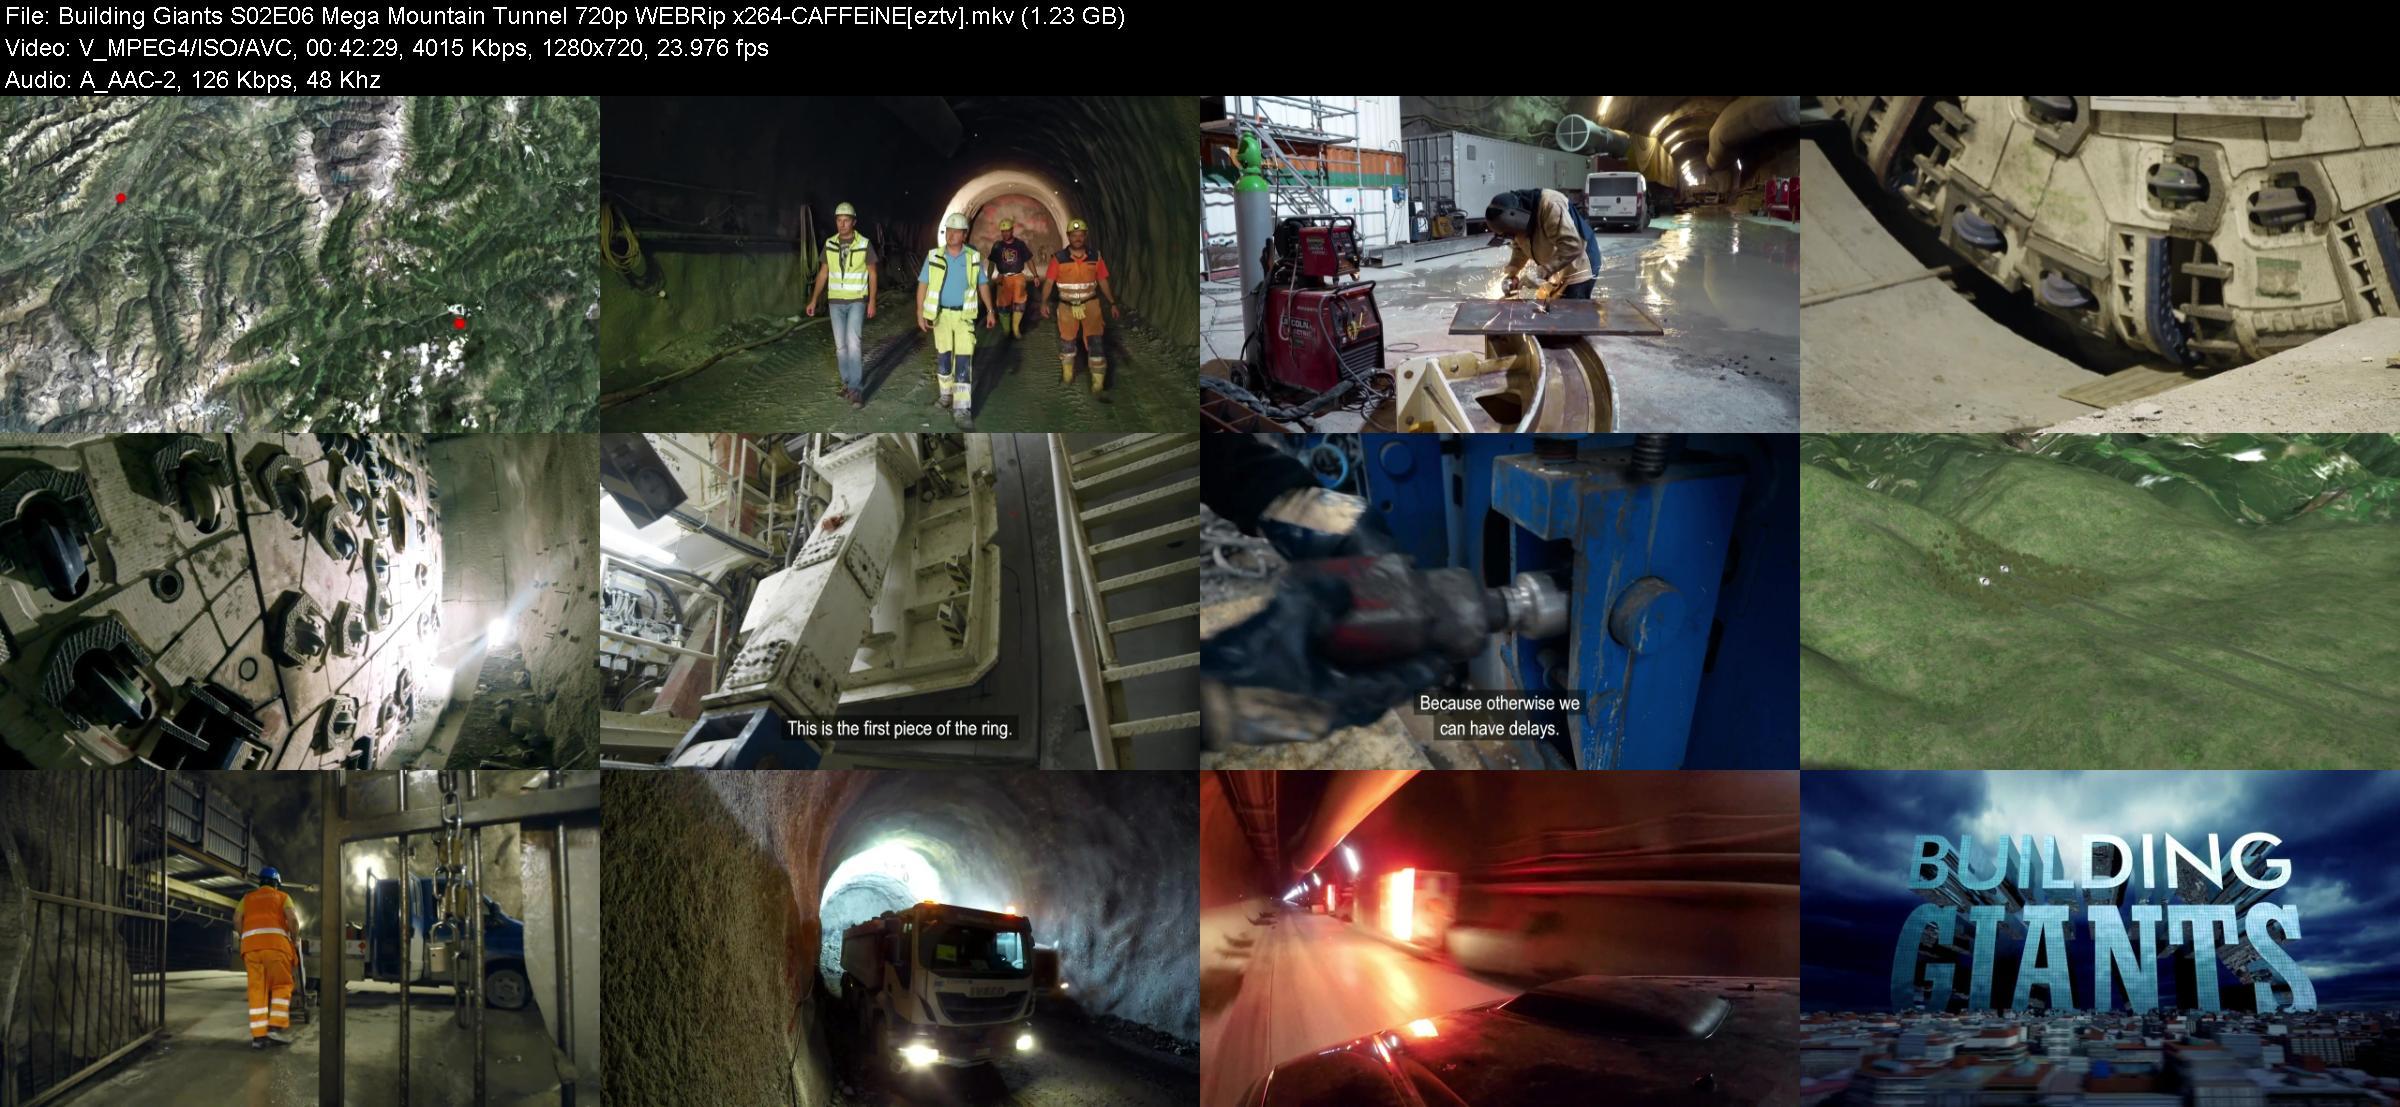 Building Giants S02E06 Mega Mountain Tunnel 720p WEBRip x264-CAFFEiNE